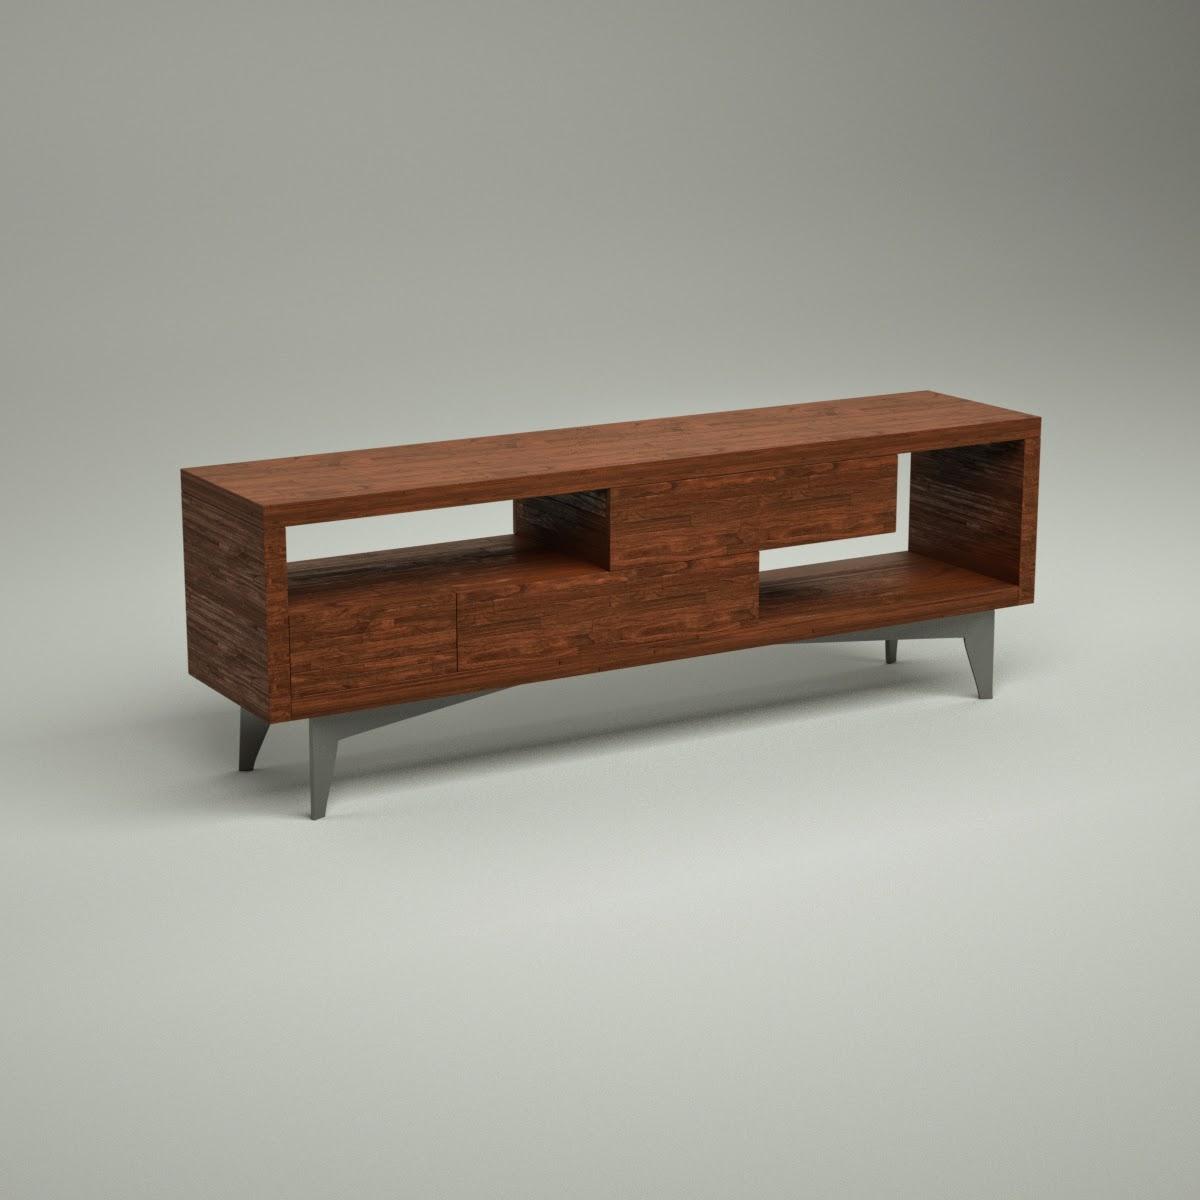 Tango Buffet Sideboard 3D Model Download fbx obj dxf blend